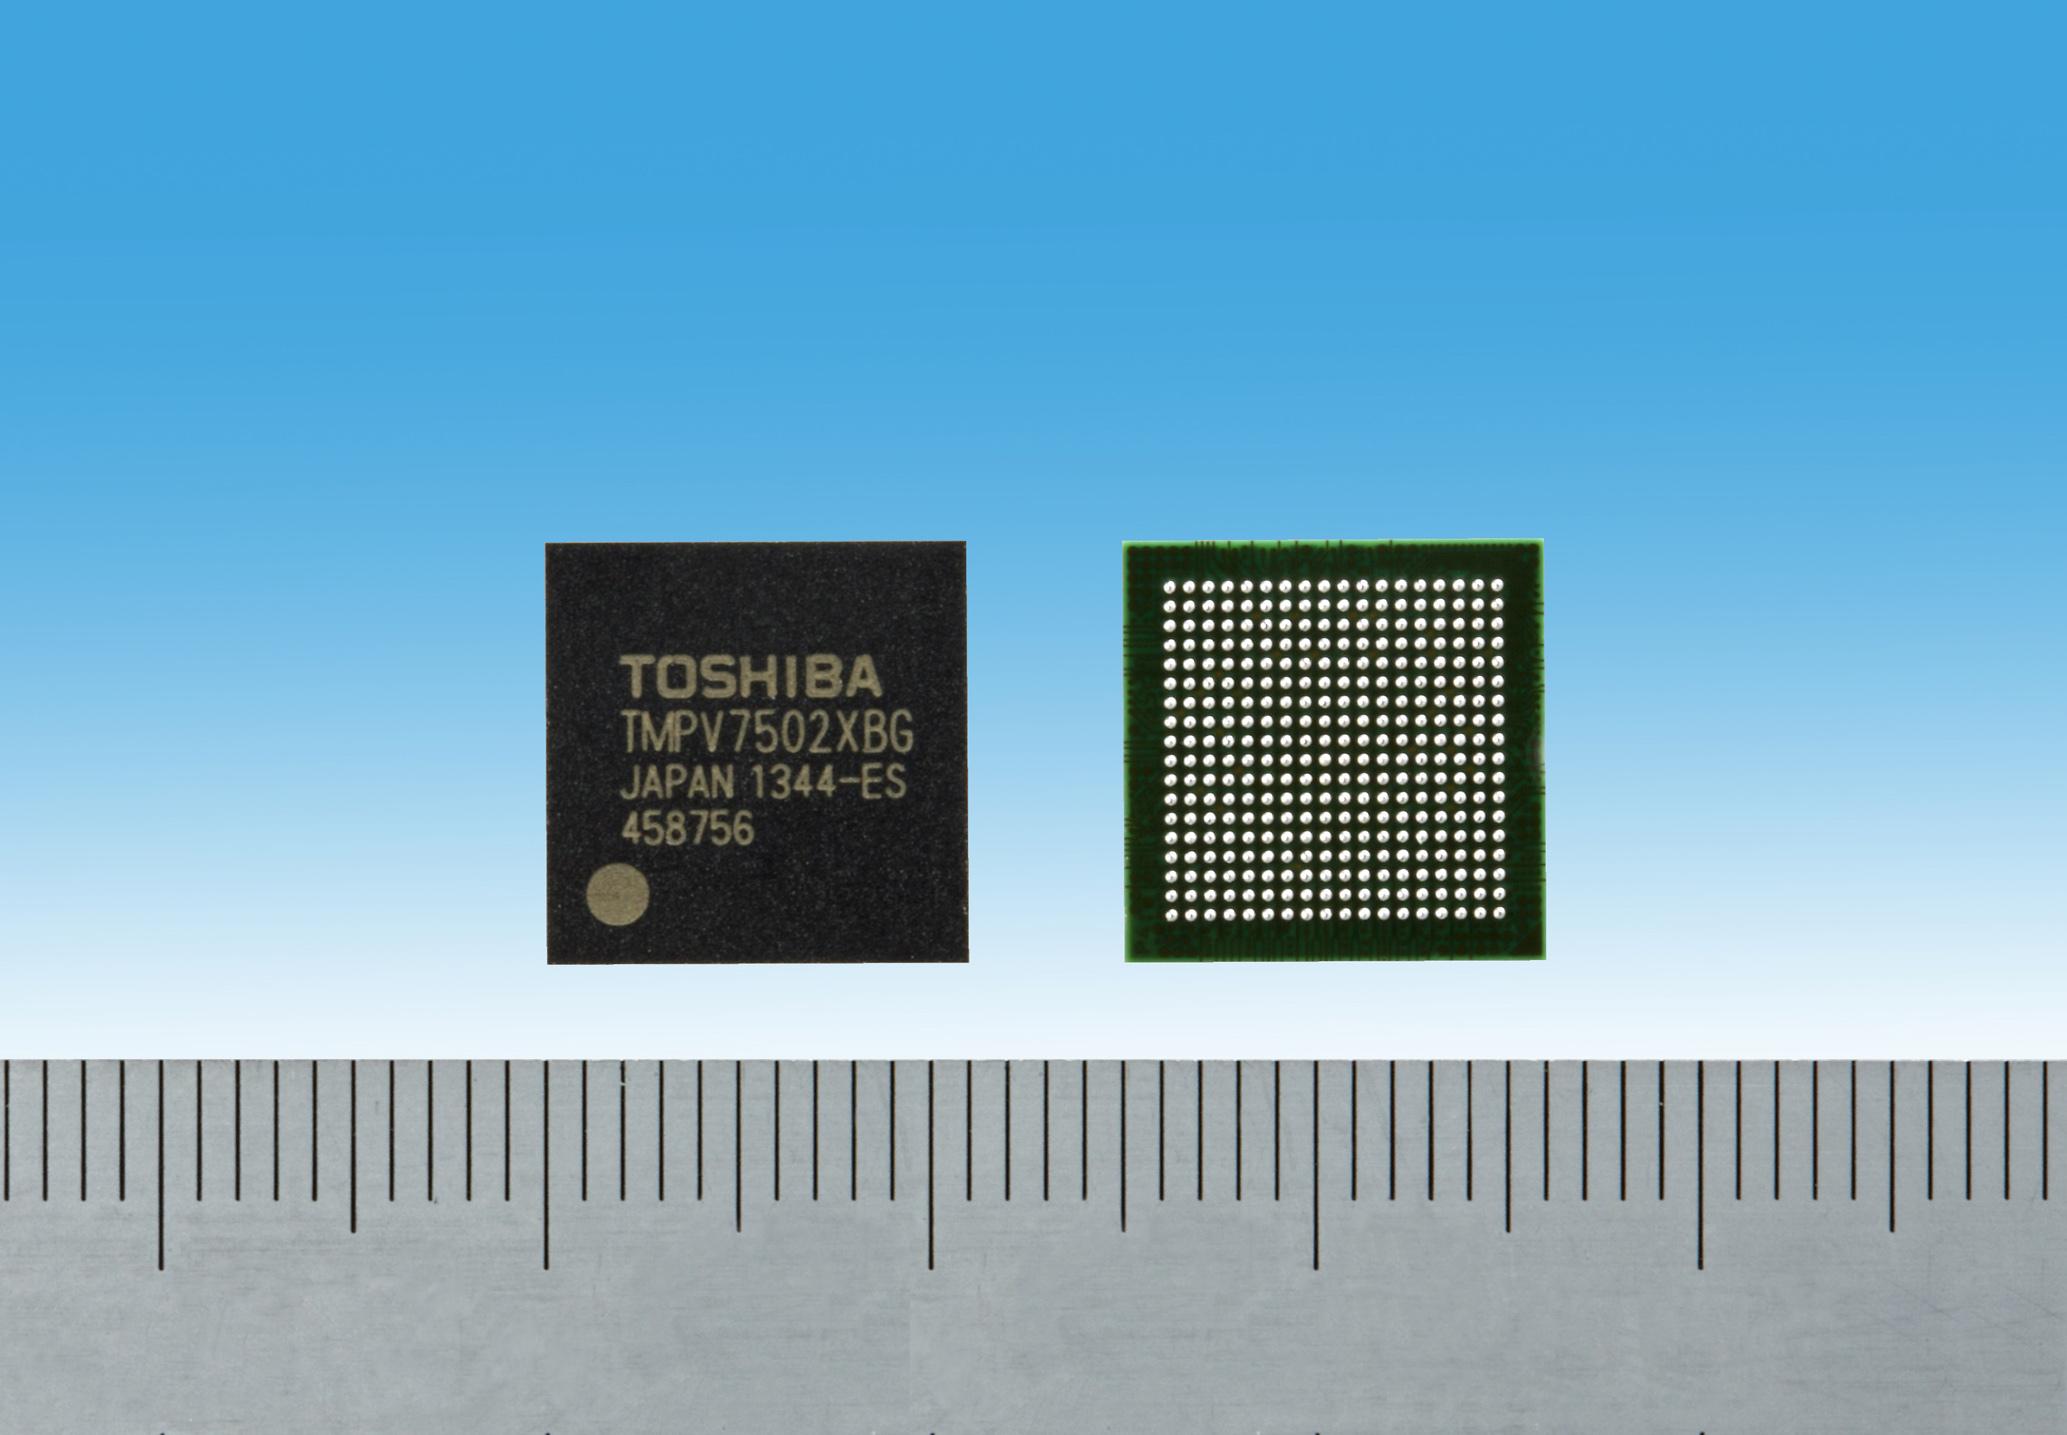 Toshiba: Image Recognition Processor TMPV7502XBG for Small-Size Camera Module (Photo: Business Wire)